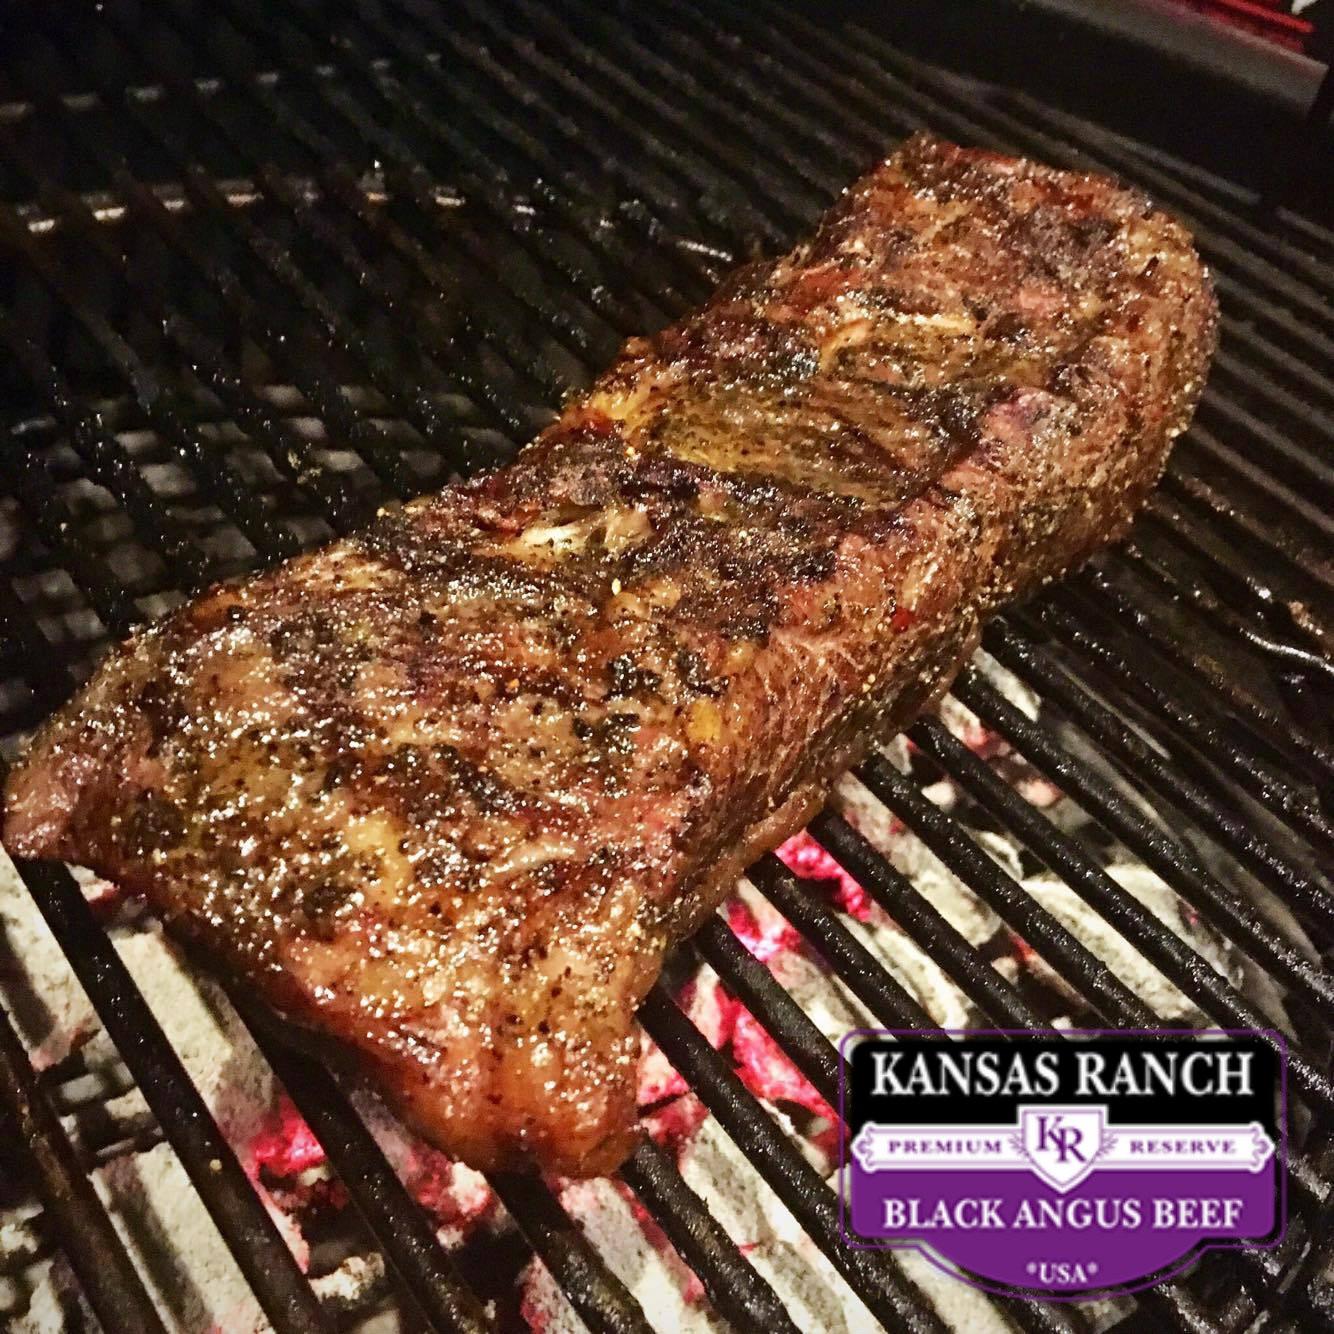 Chuck Flap Roast. Kansas Ranch Black Angus